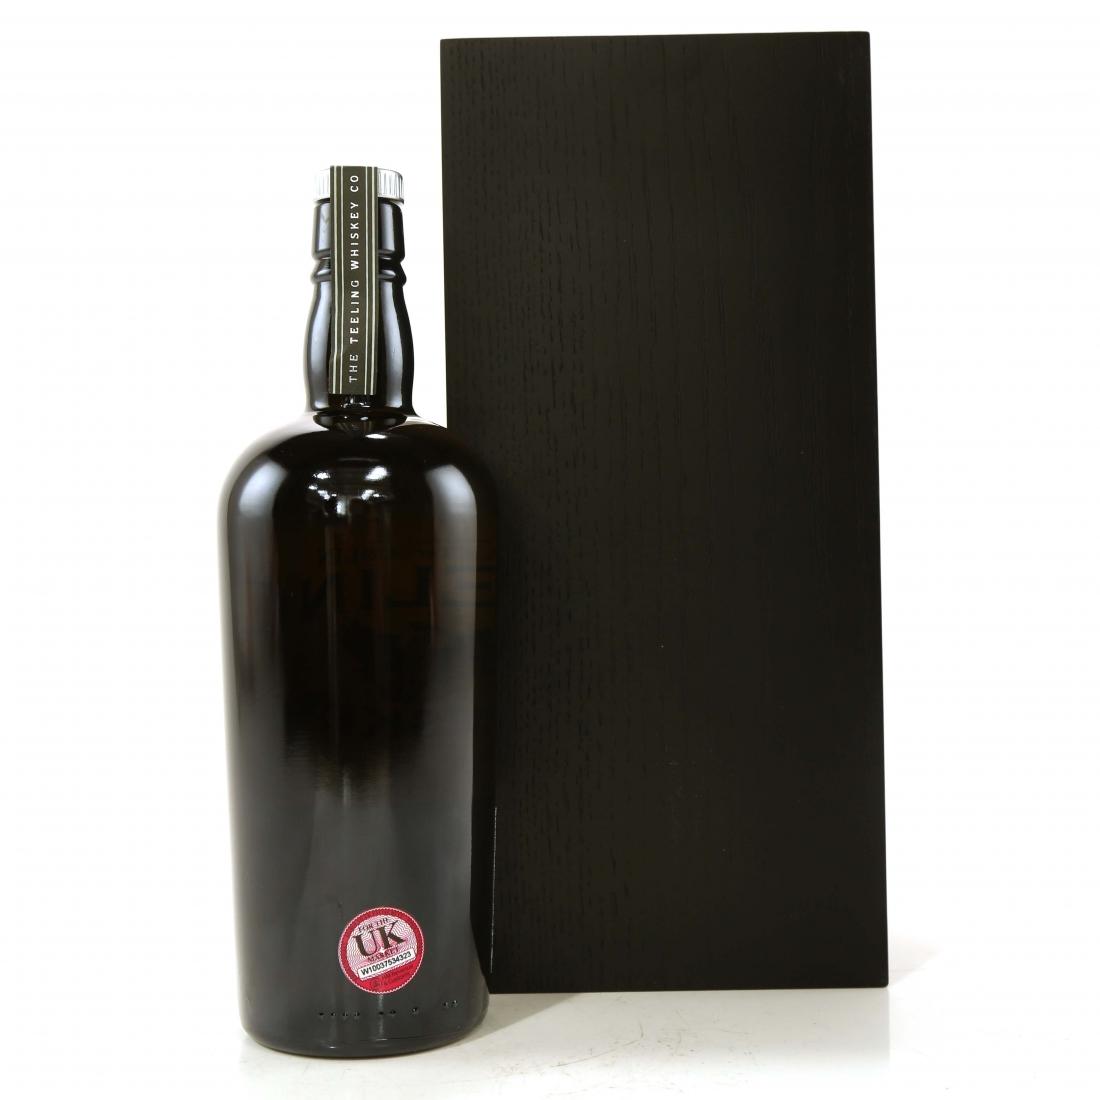 Teeling Celebratory Single Pot Still Whiskey / Bottle #046